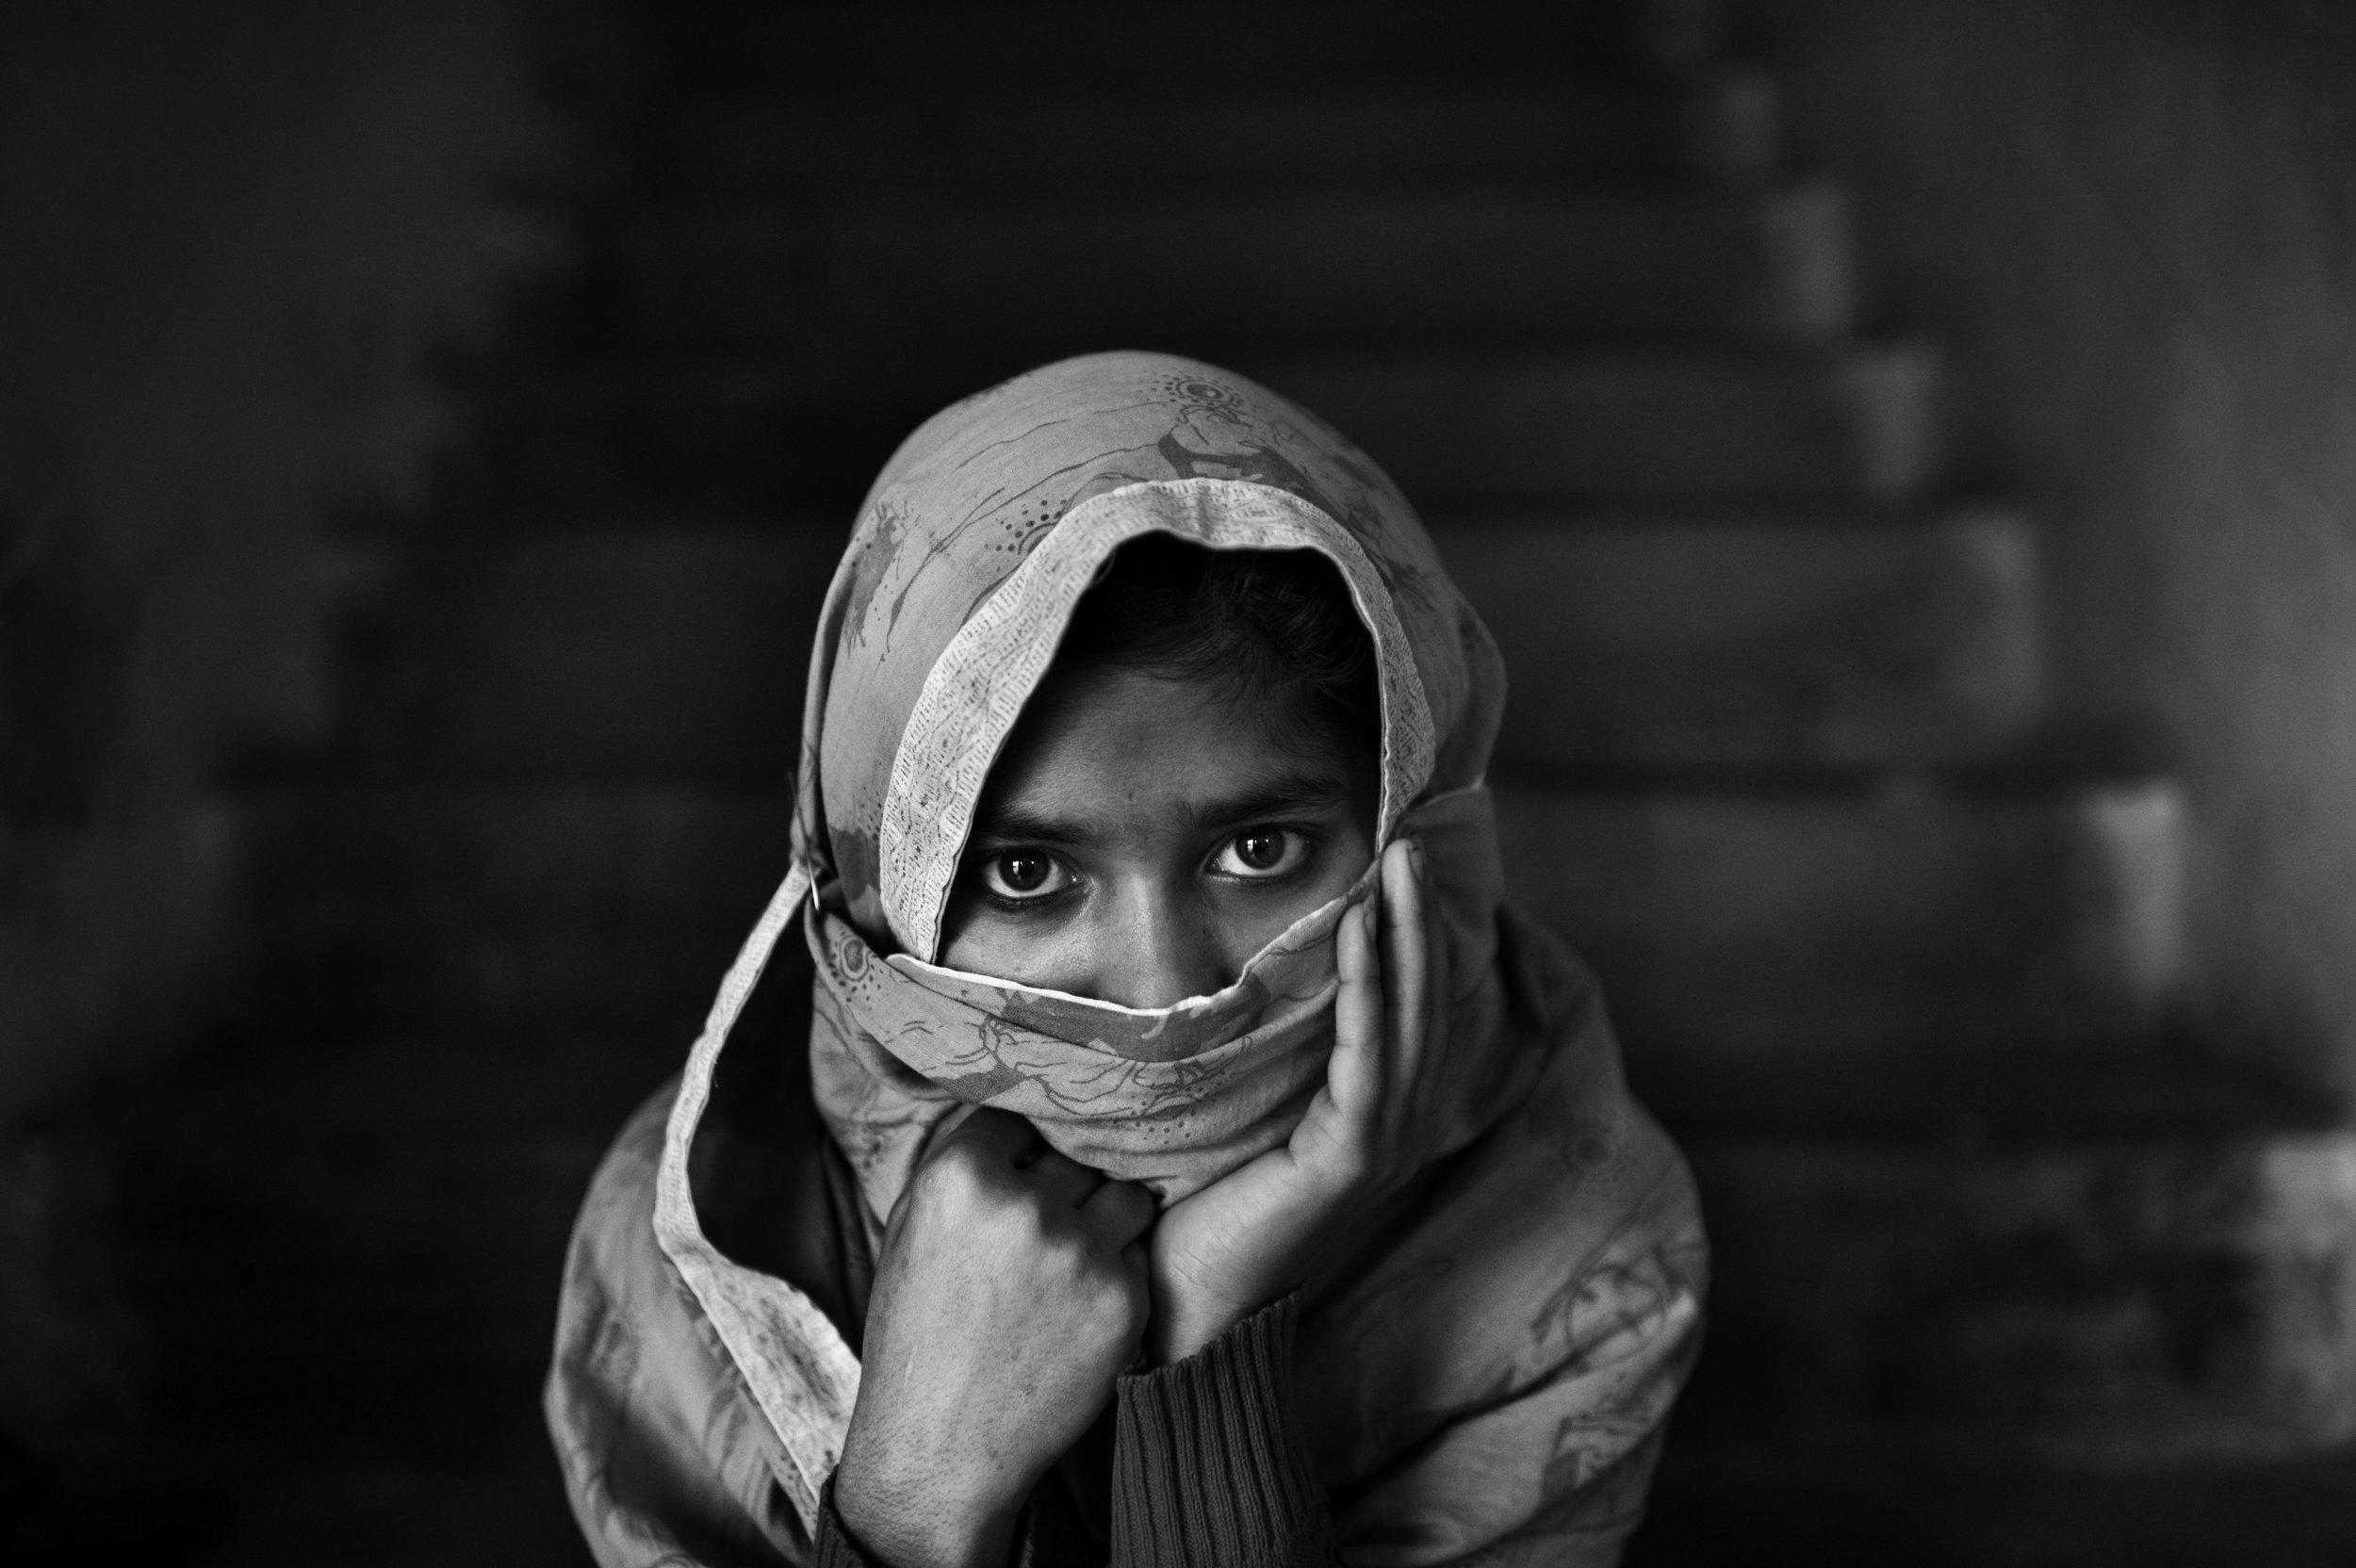 Forced: Child Labour & Explotation - by Pep Bonet